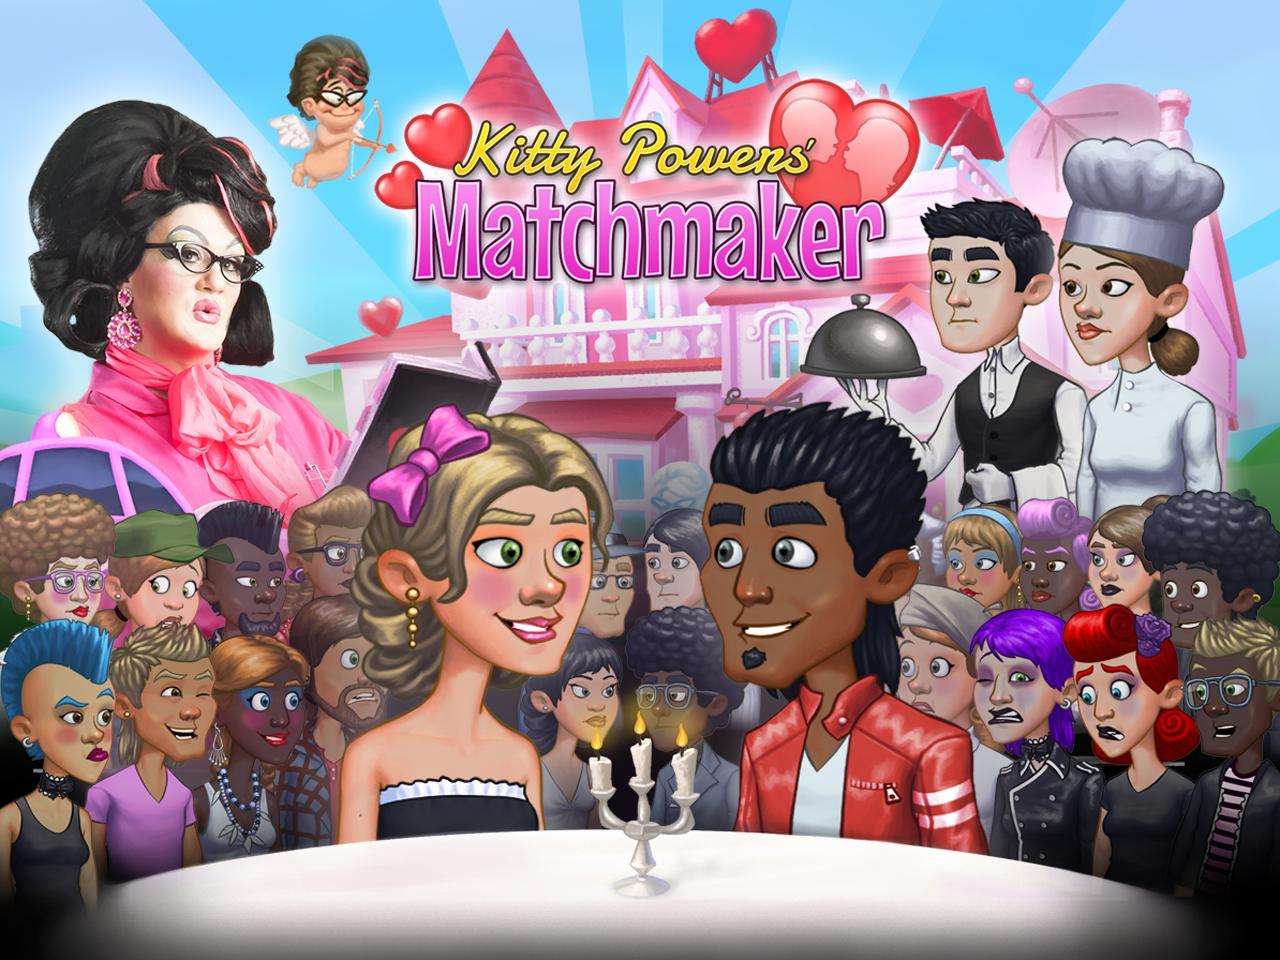 Matchmaker simulator